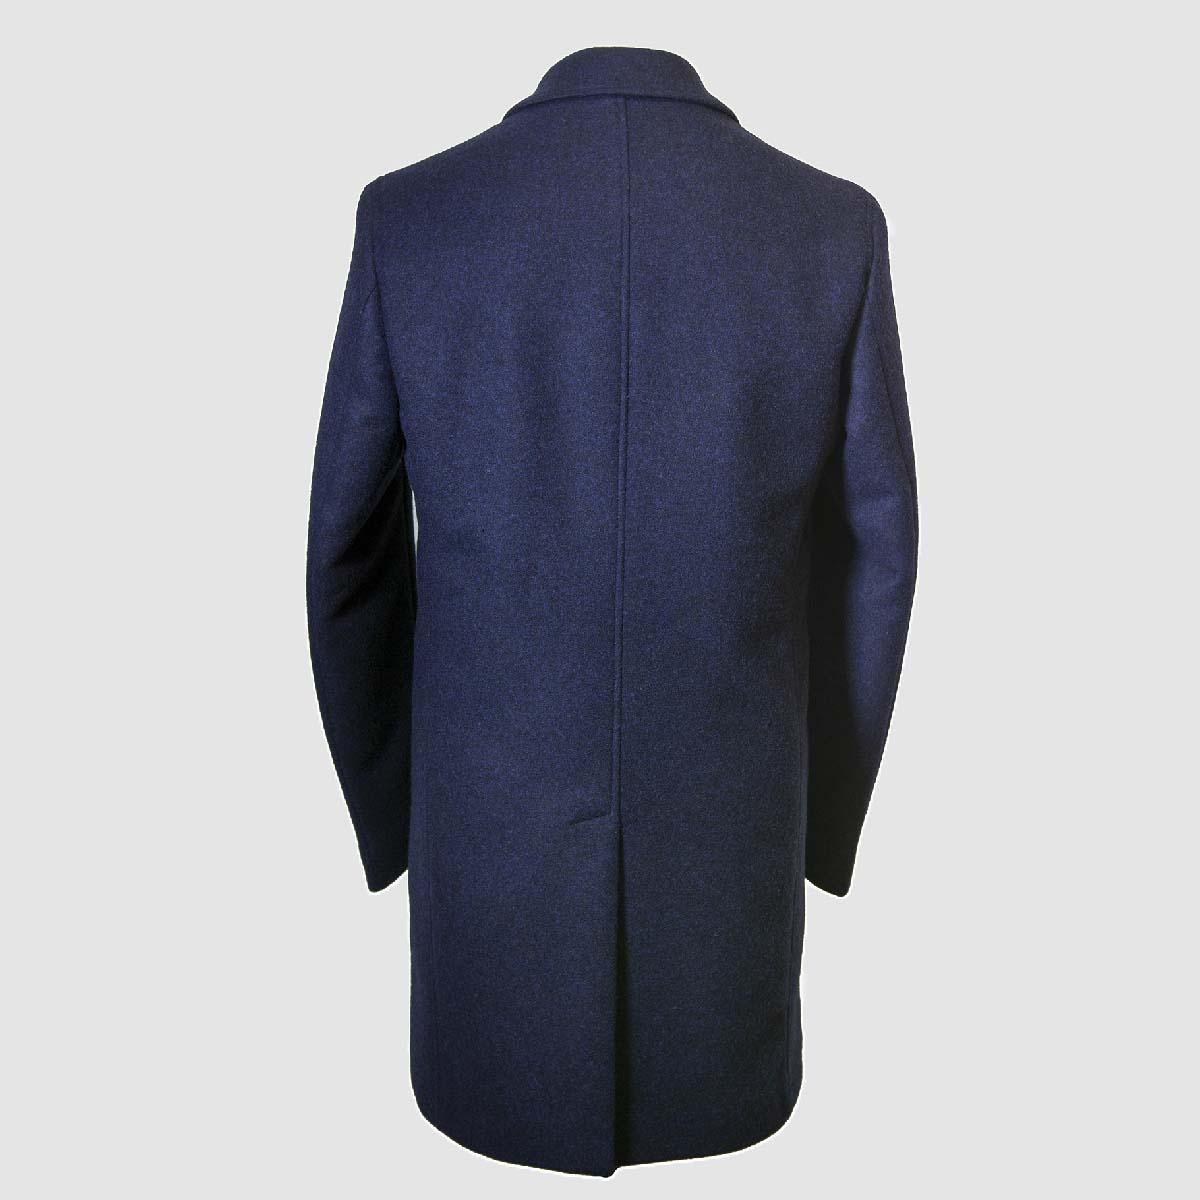 Overcoat Blue in 100% Lana